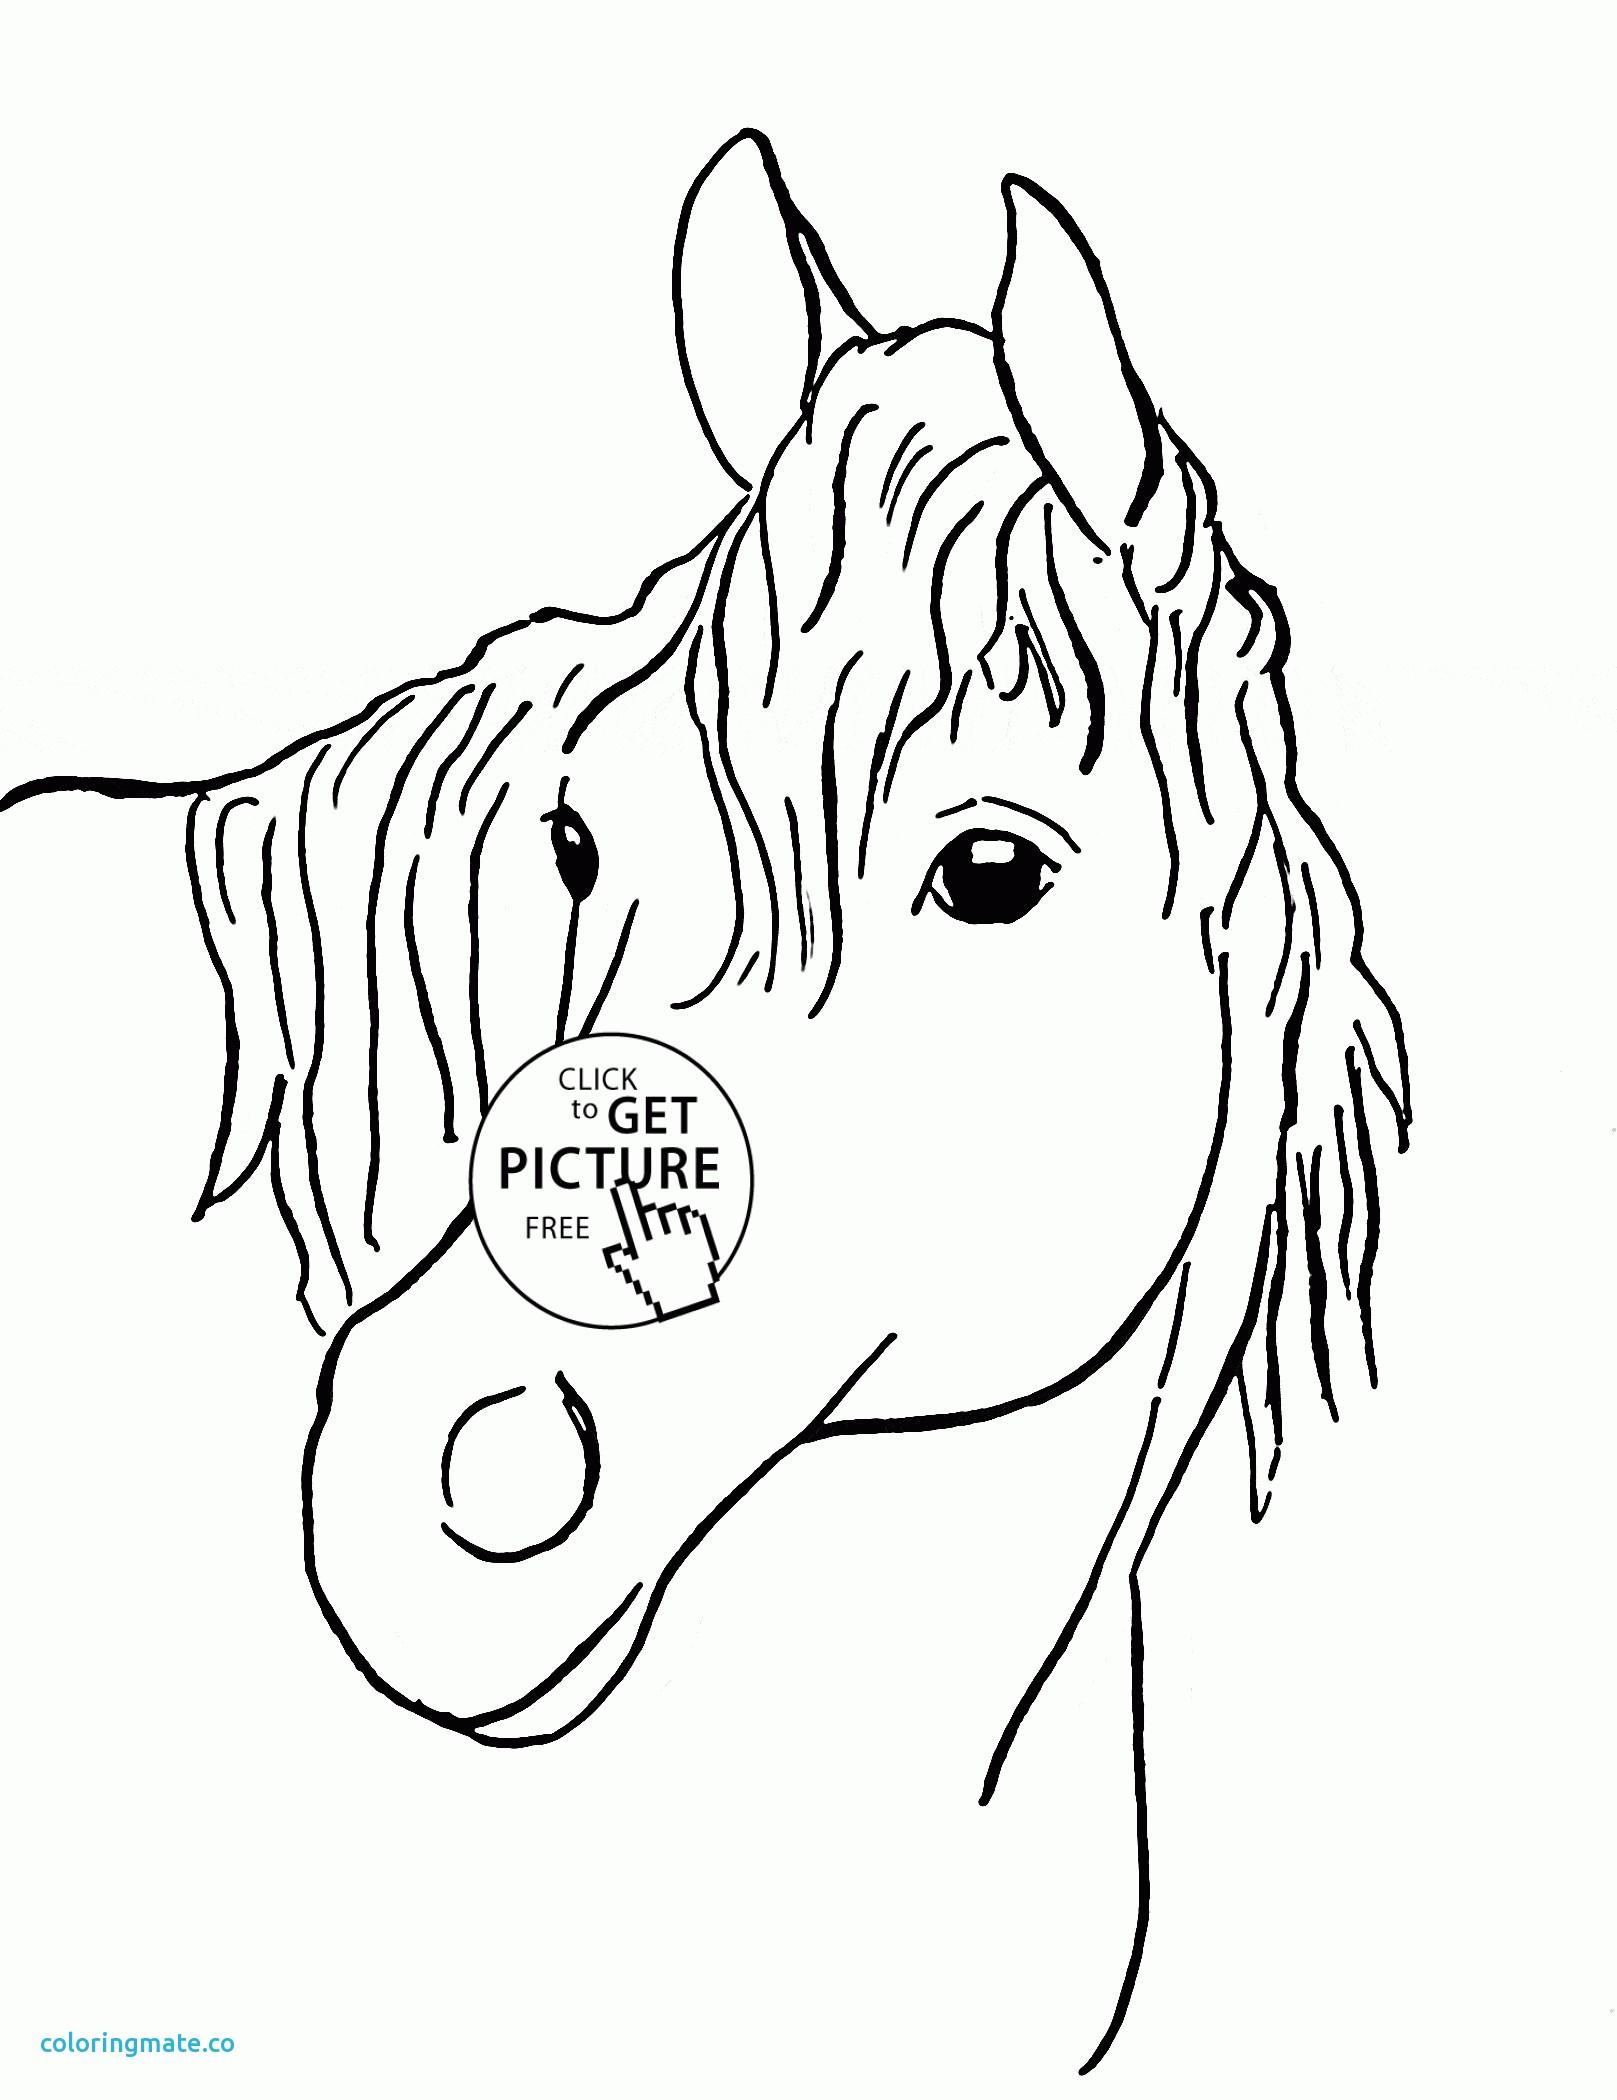 1617x2100 Horse Face Coloring Page Best Of 25 Unique Pages